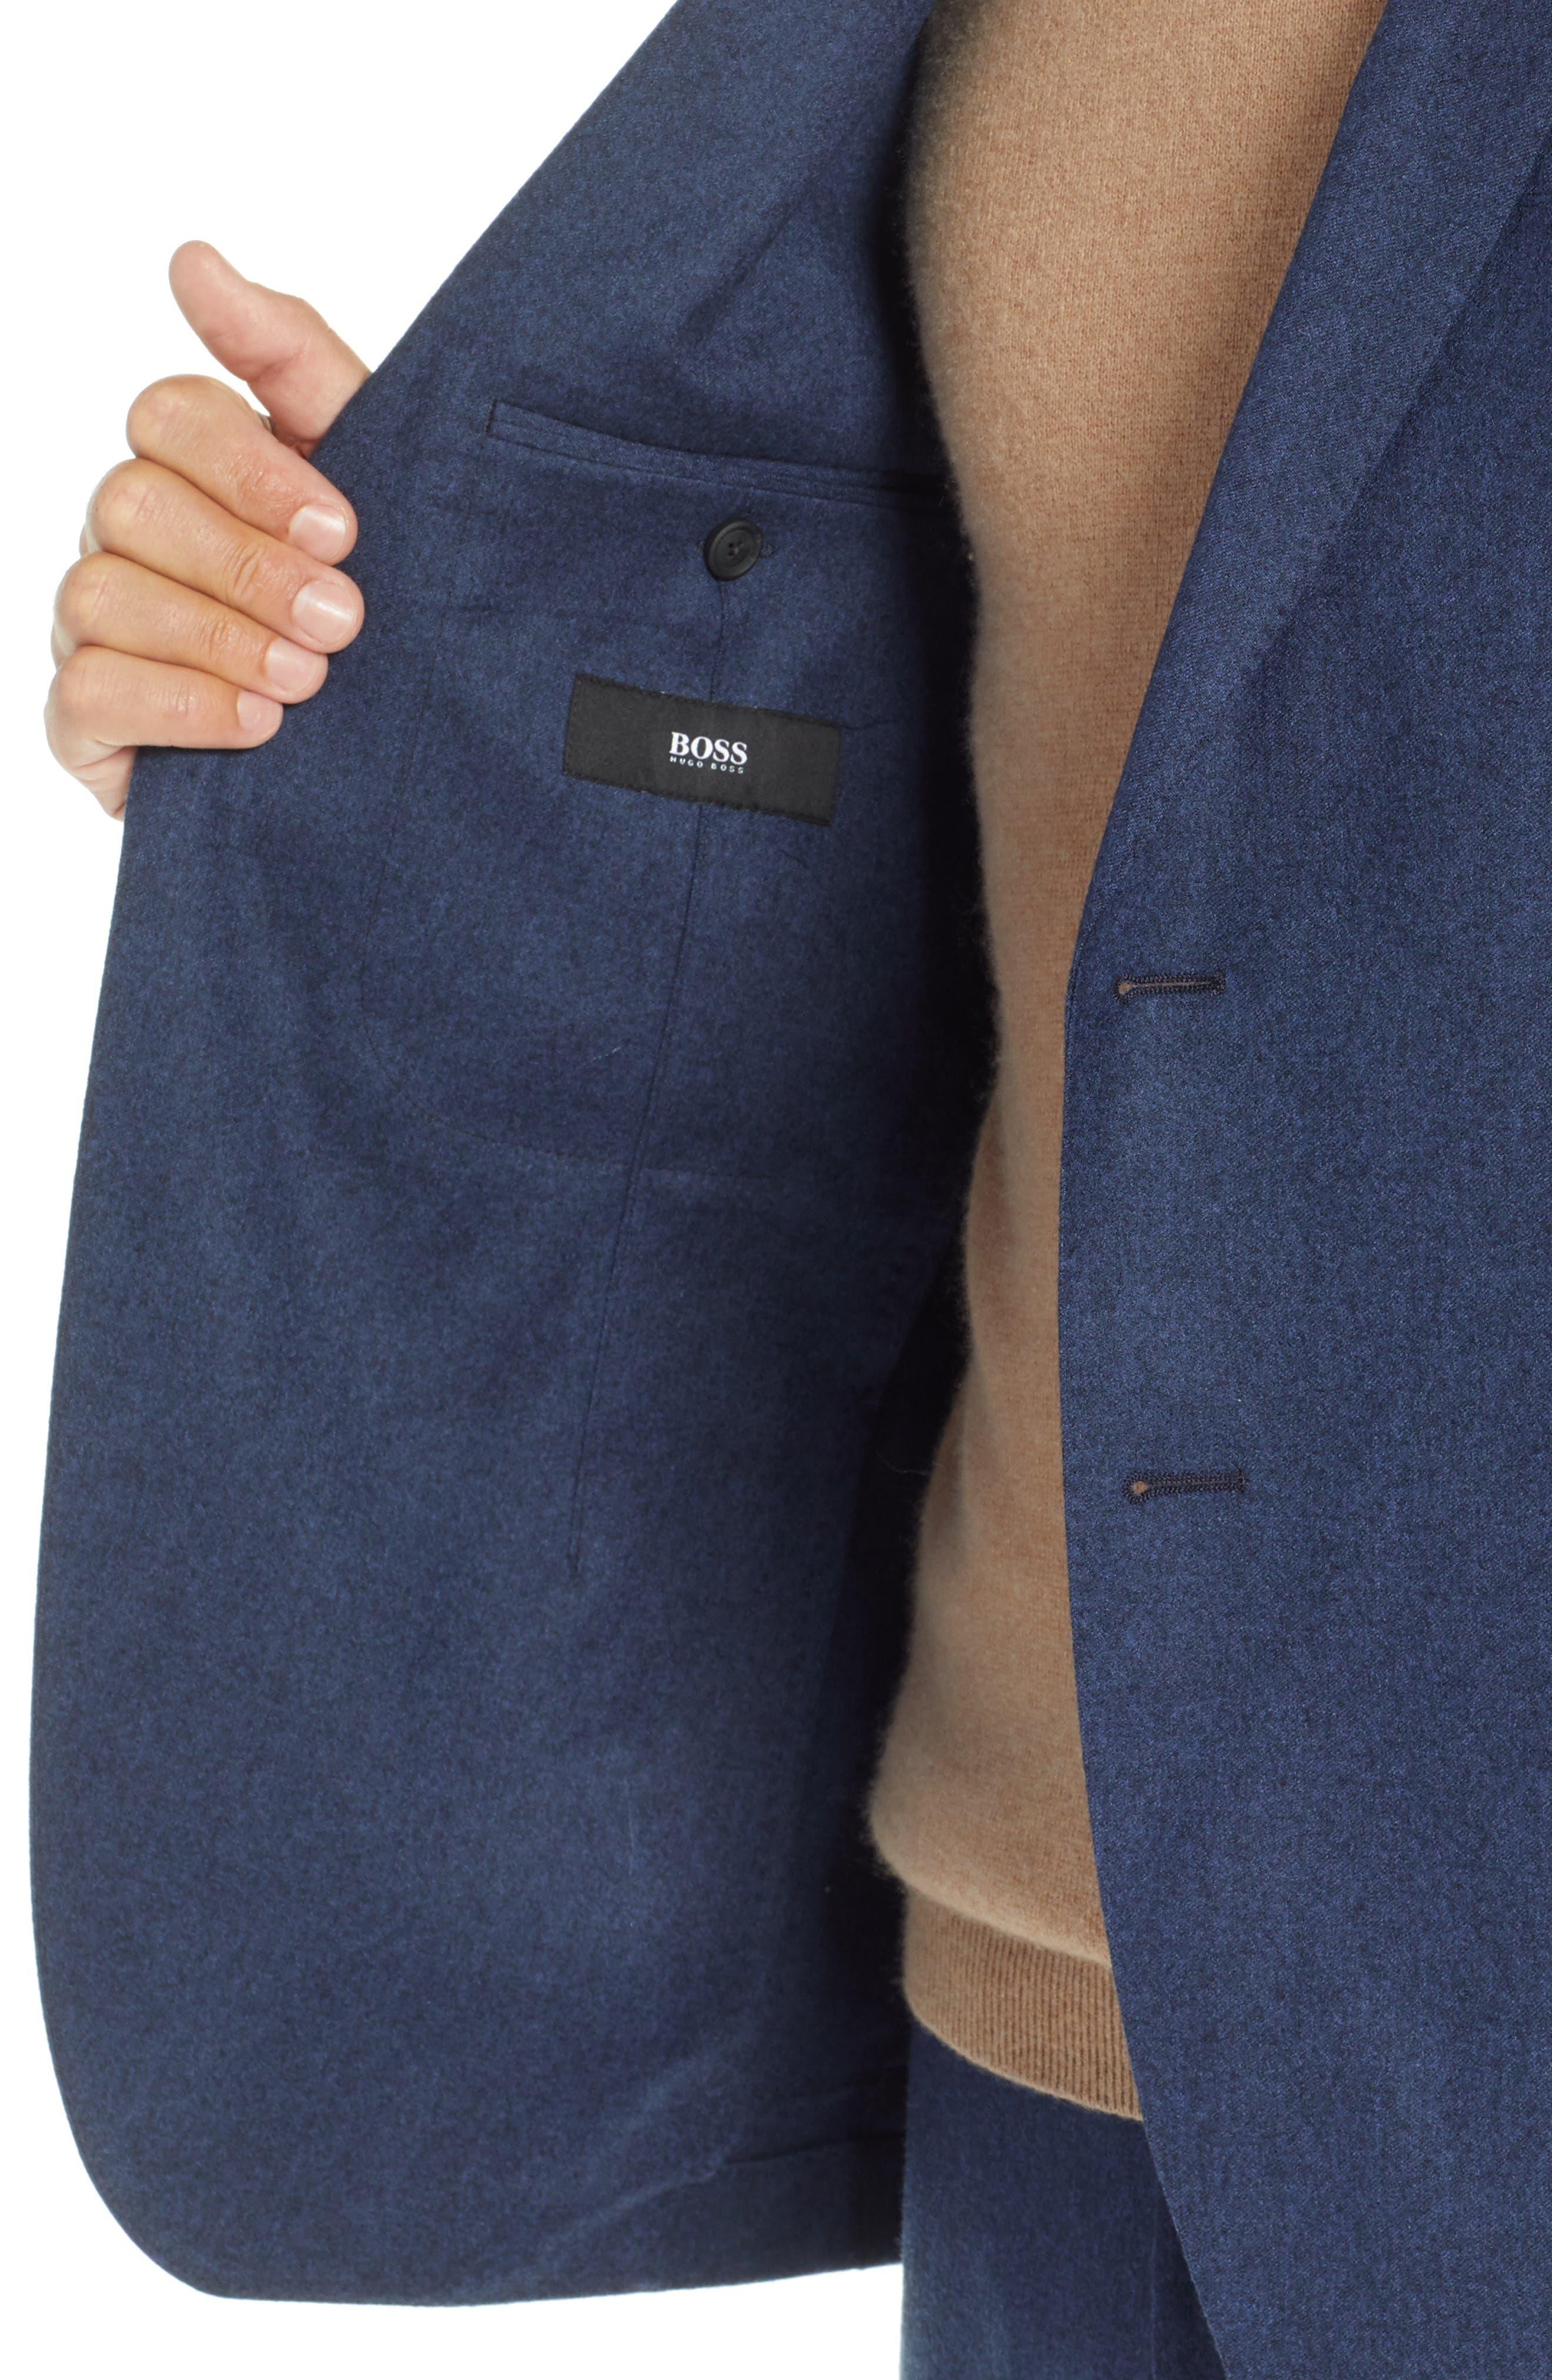 Hooper Trim Fit Wool Blazer,                             Alternate thumbnail 4, color,                             DARK BLUE